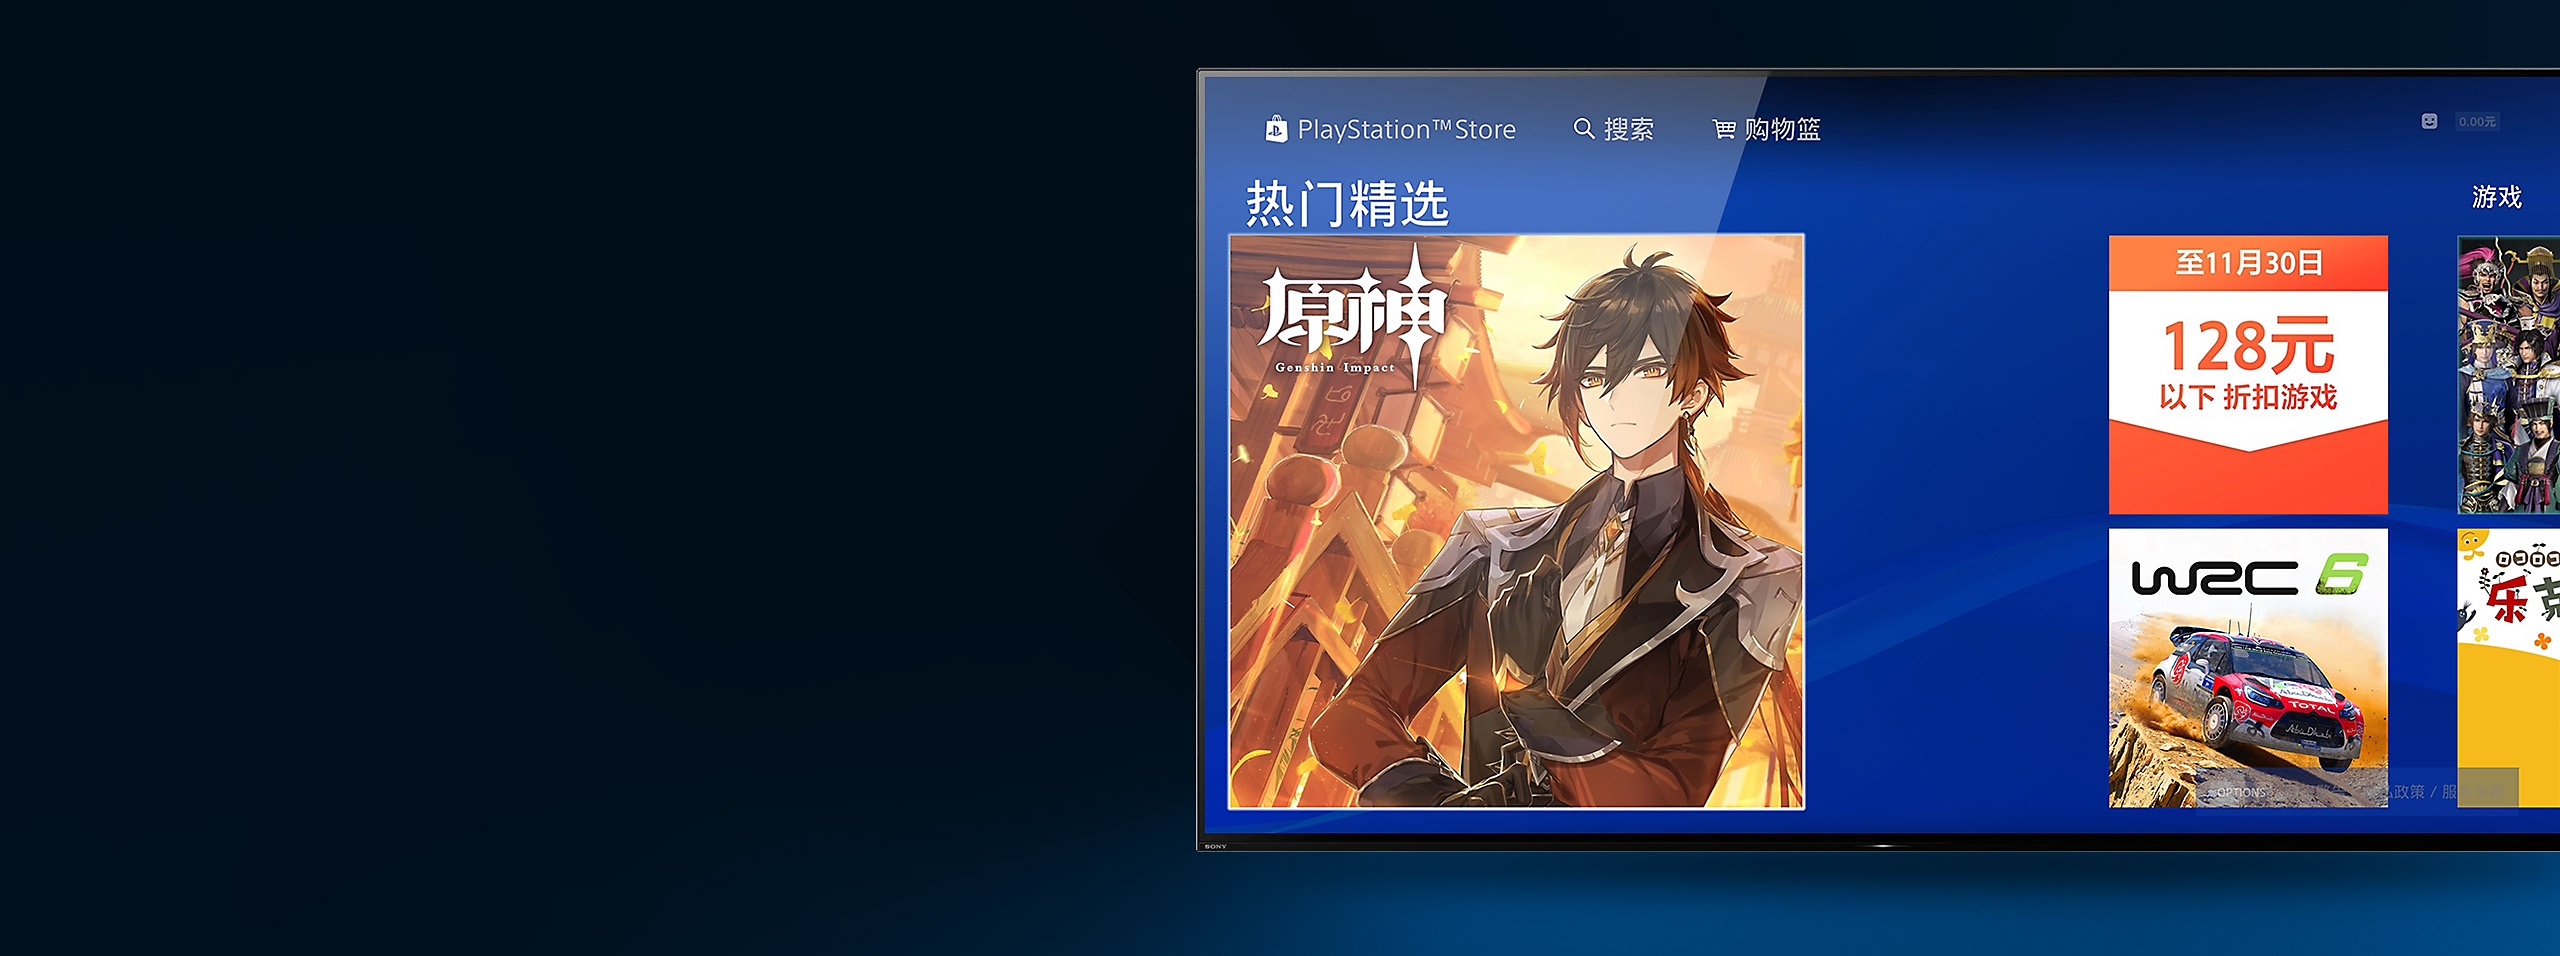 PlayStation Store - 页面横幅艺术图